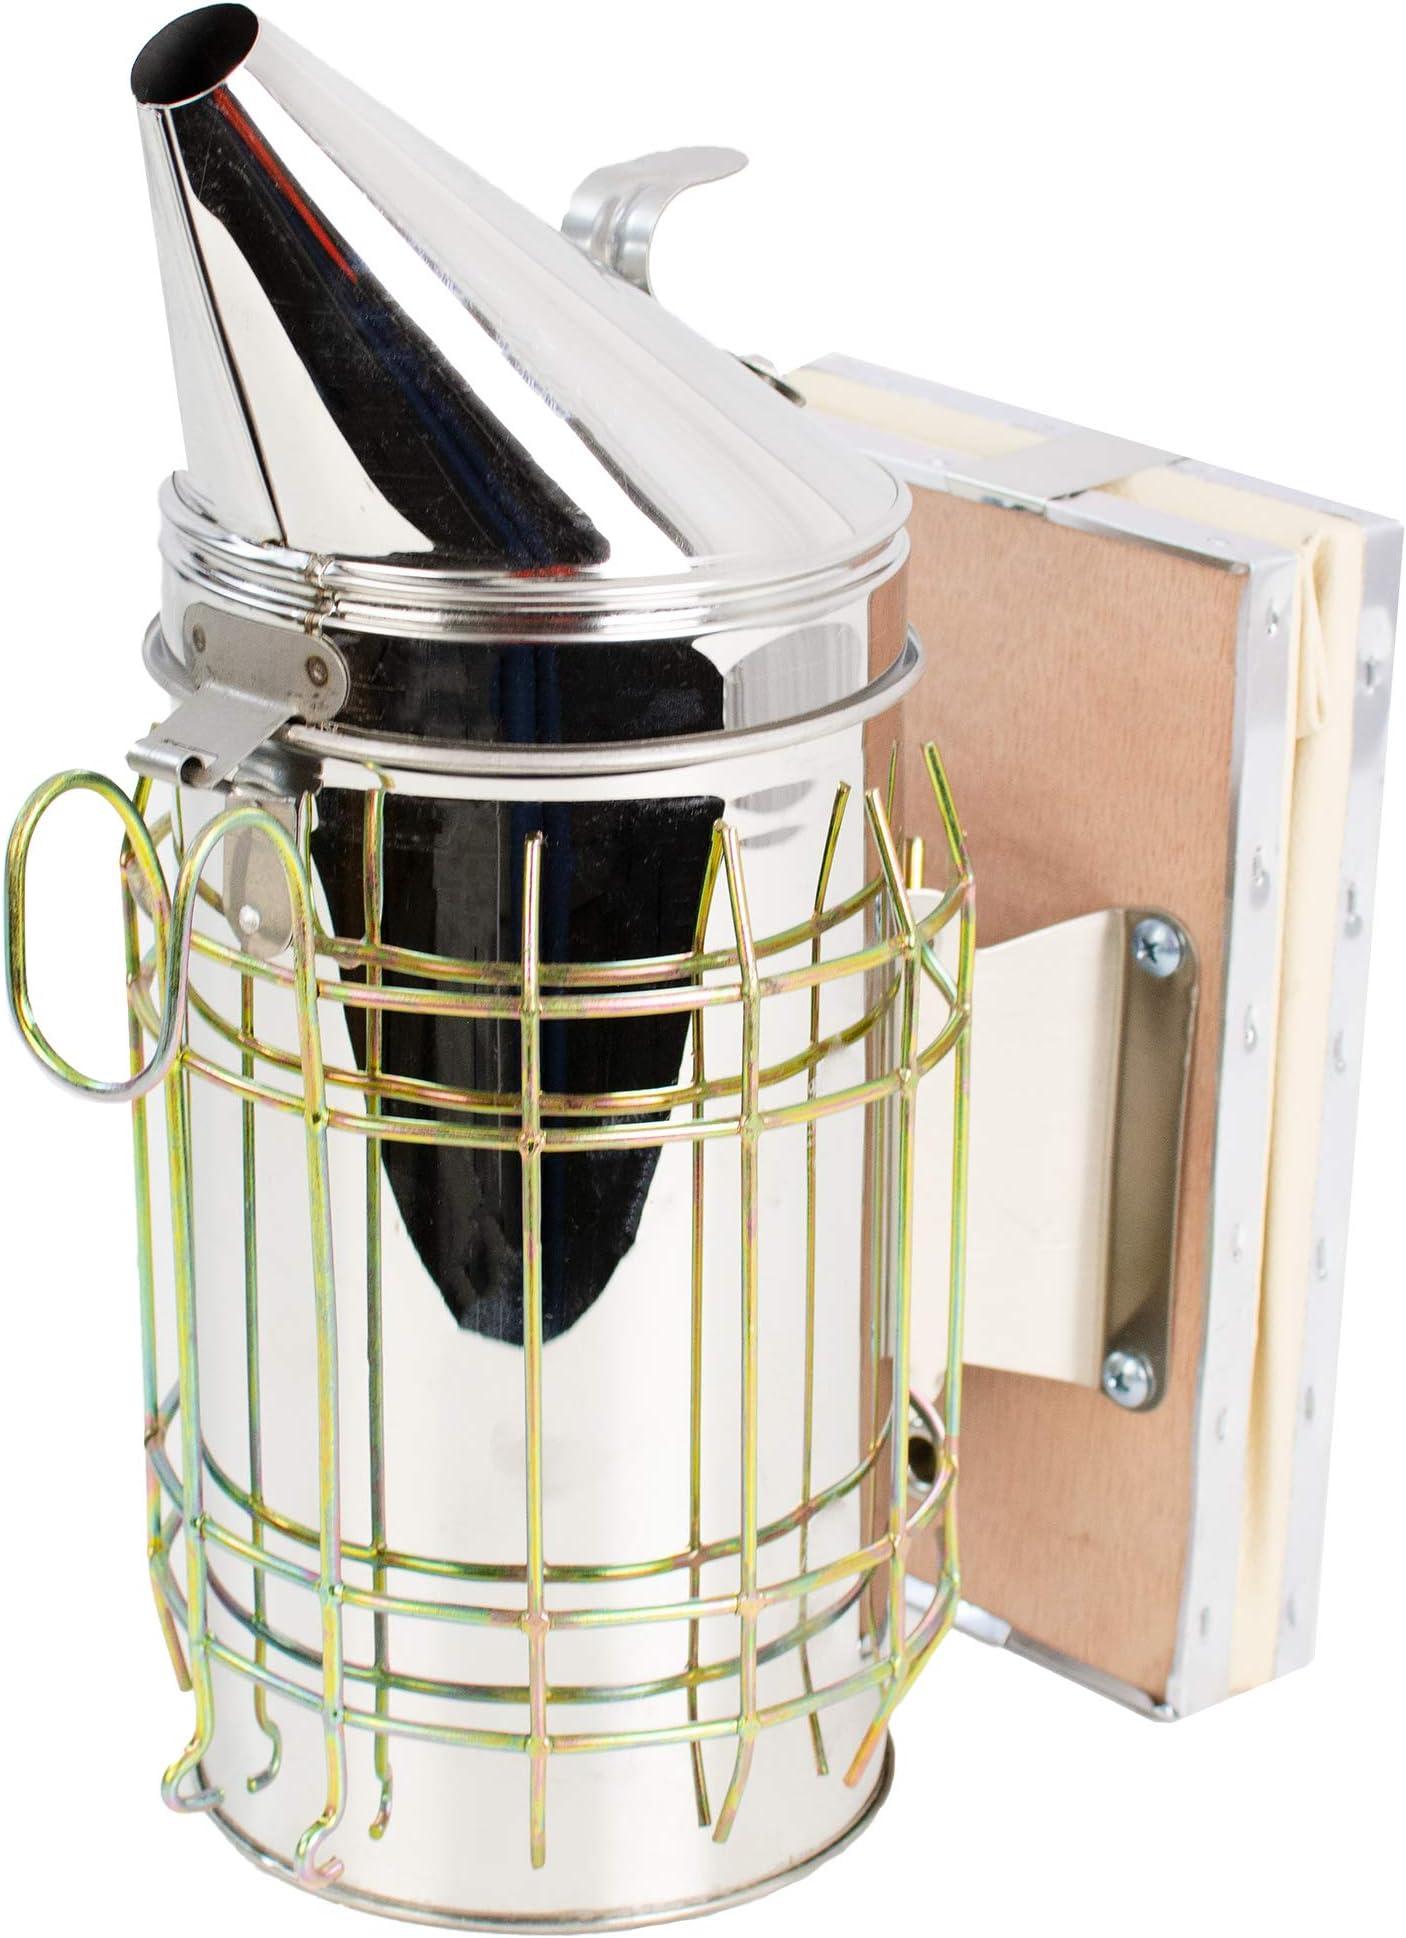 beekeeping supplies amazon comvivo new bee hive smoker stainless steel w heat shield beekeeping equipment from